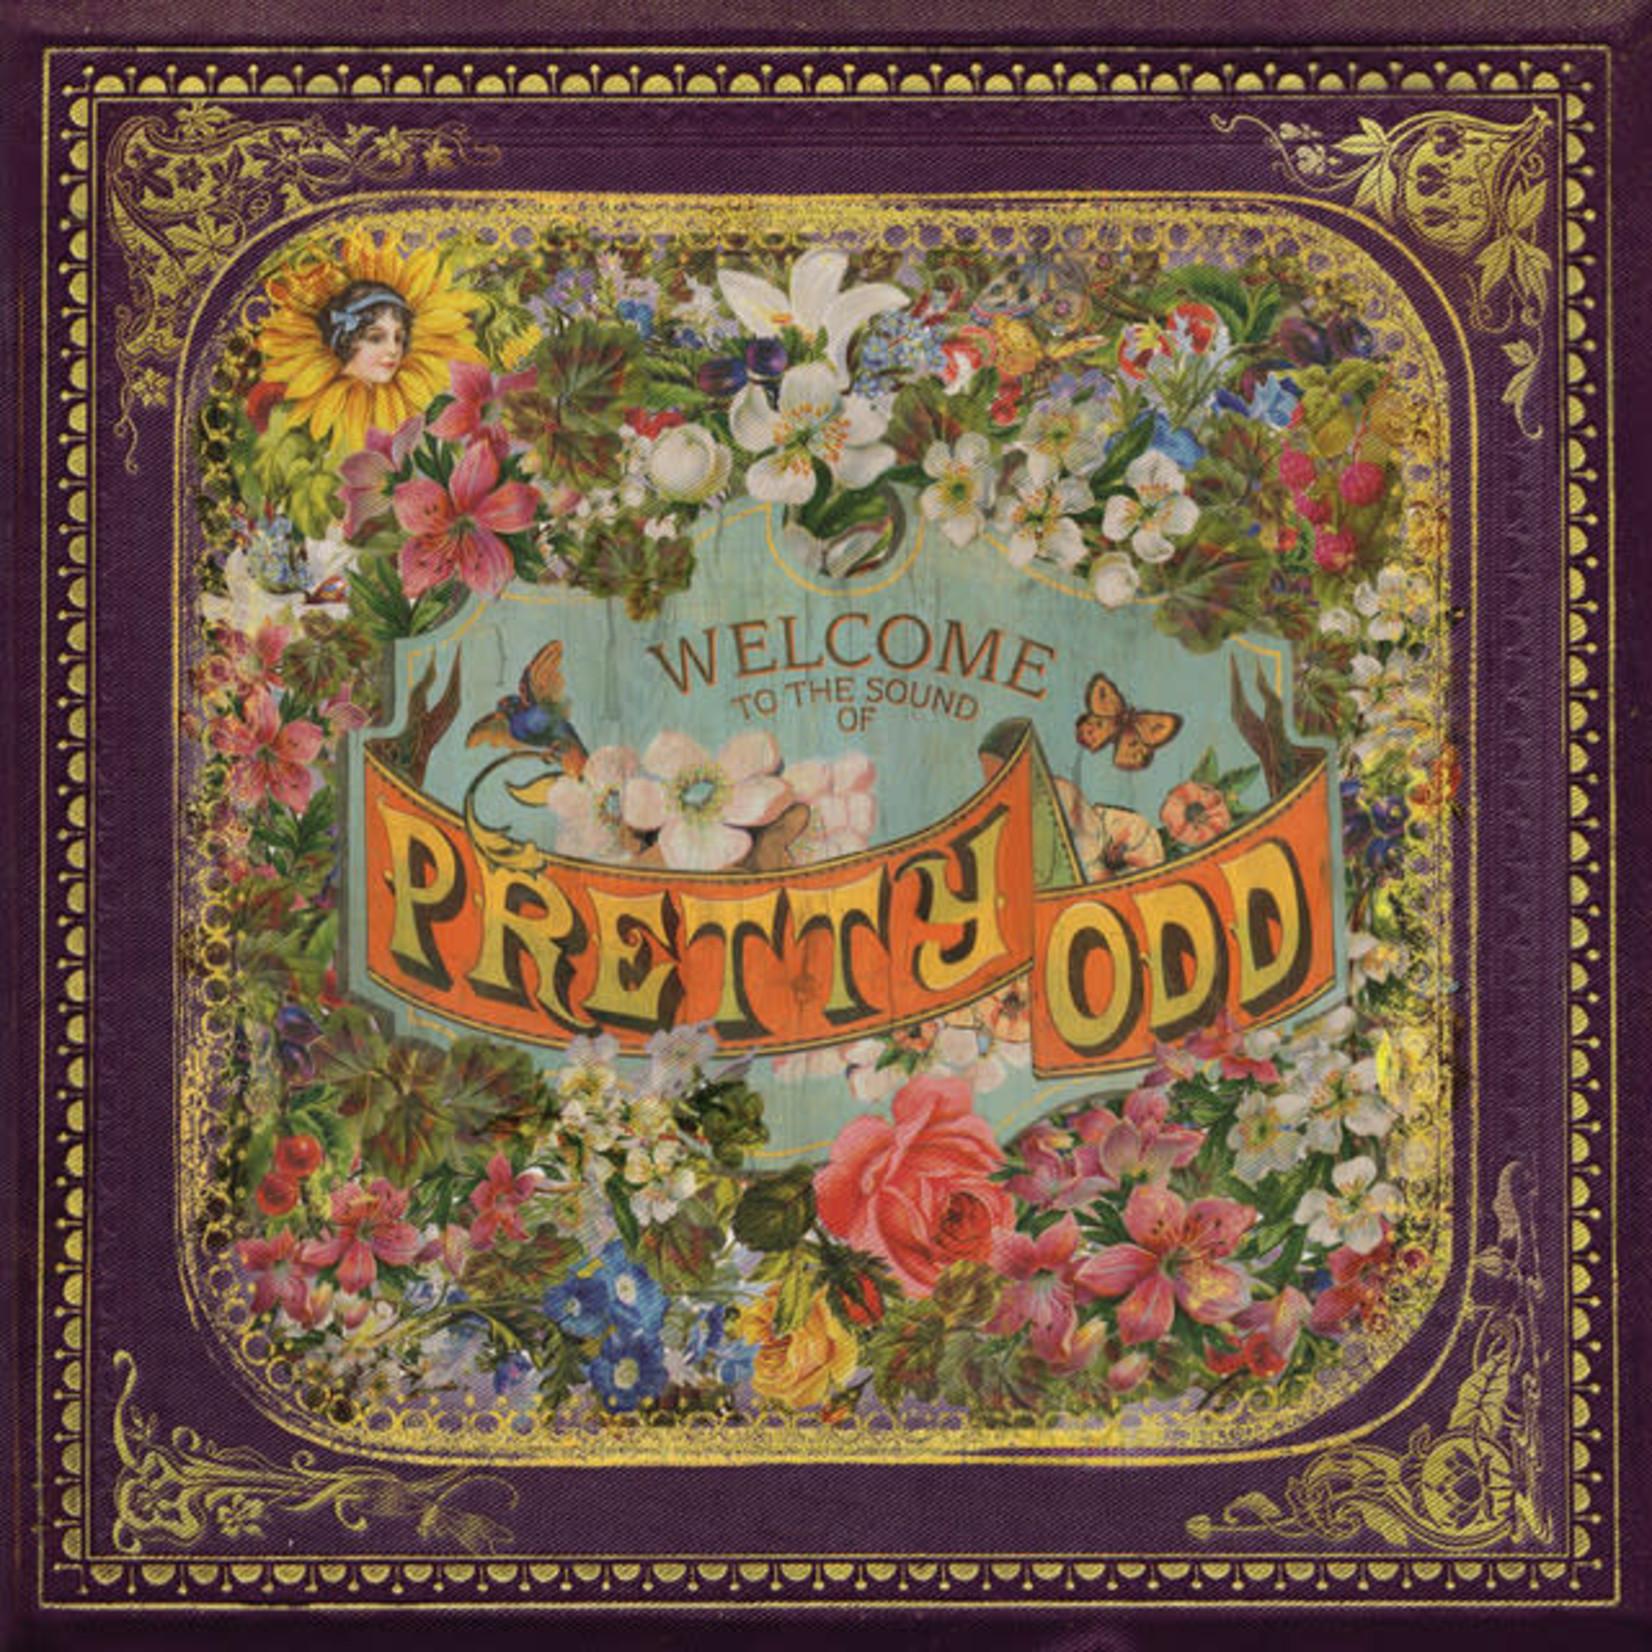 Vinyl Panic At The Disc - Pretty Odd